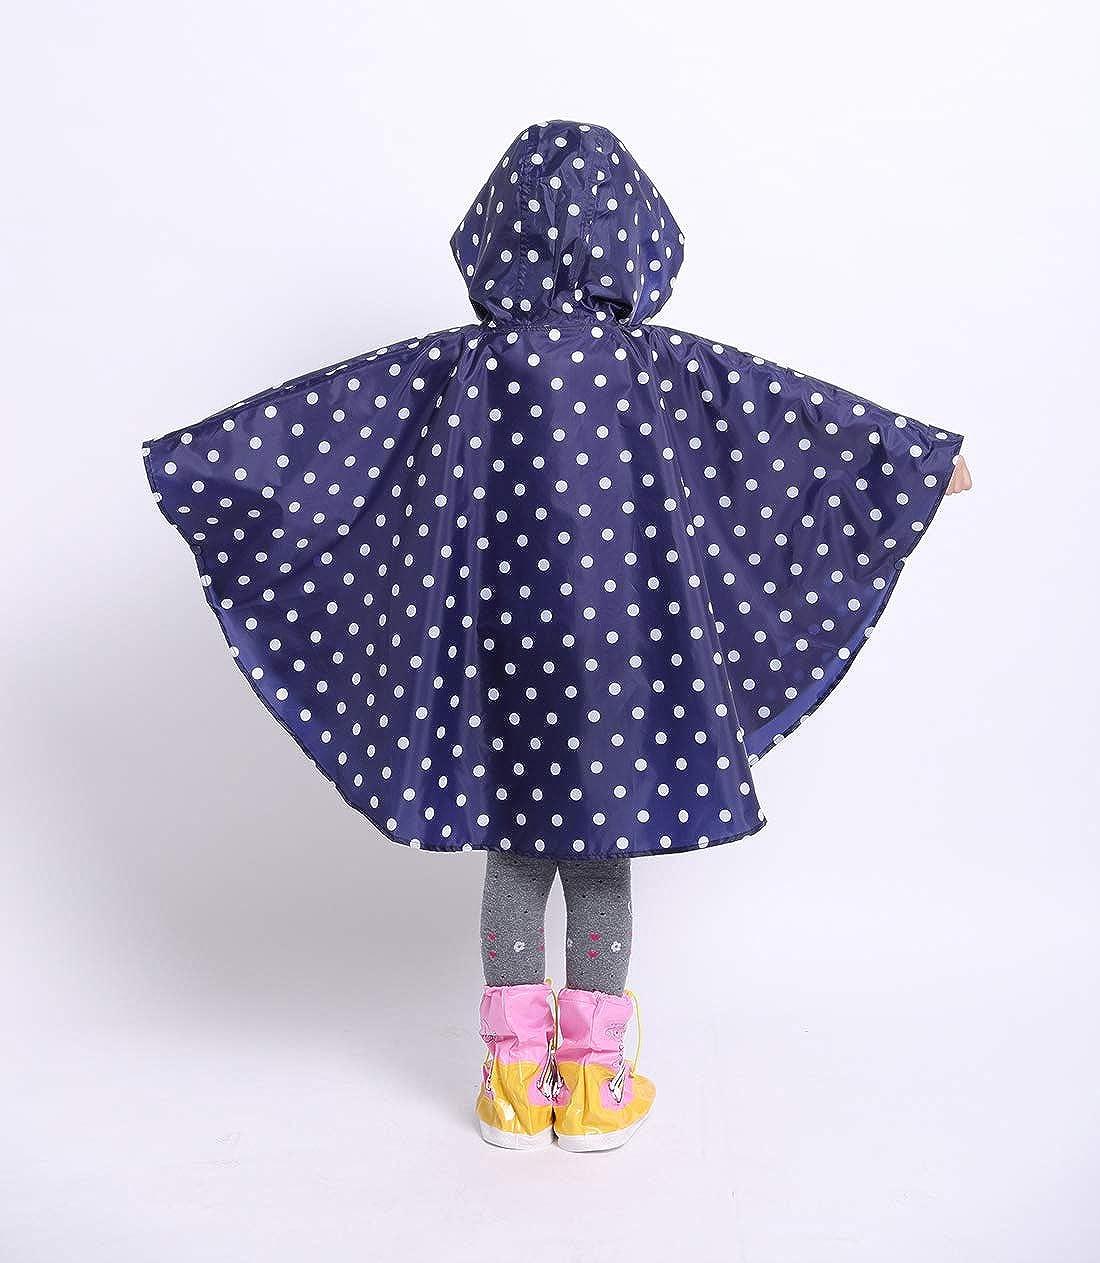 D C.Supernice Kids Poncho Waterproof Unisex Toddler Boys Girls Cute Stars Pattern Hooded Cape Rain Coats with Portable Waterproof Bag